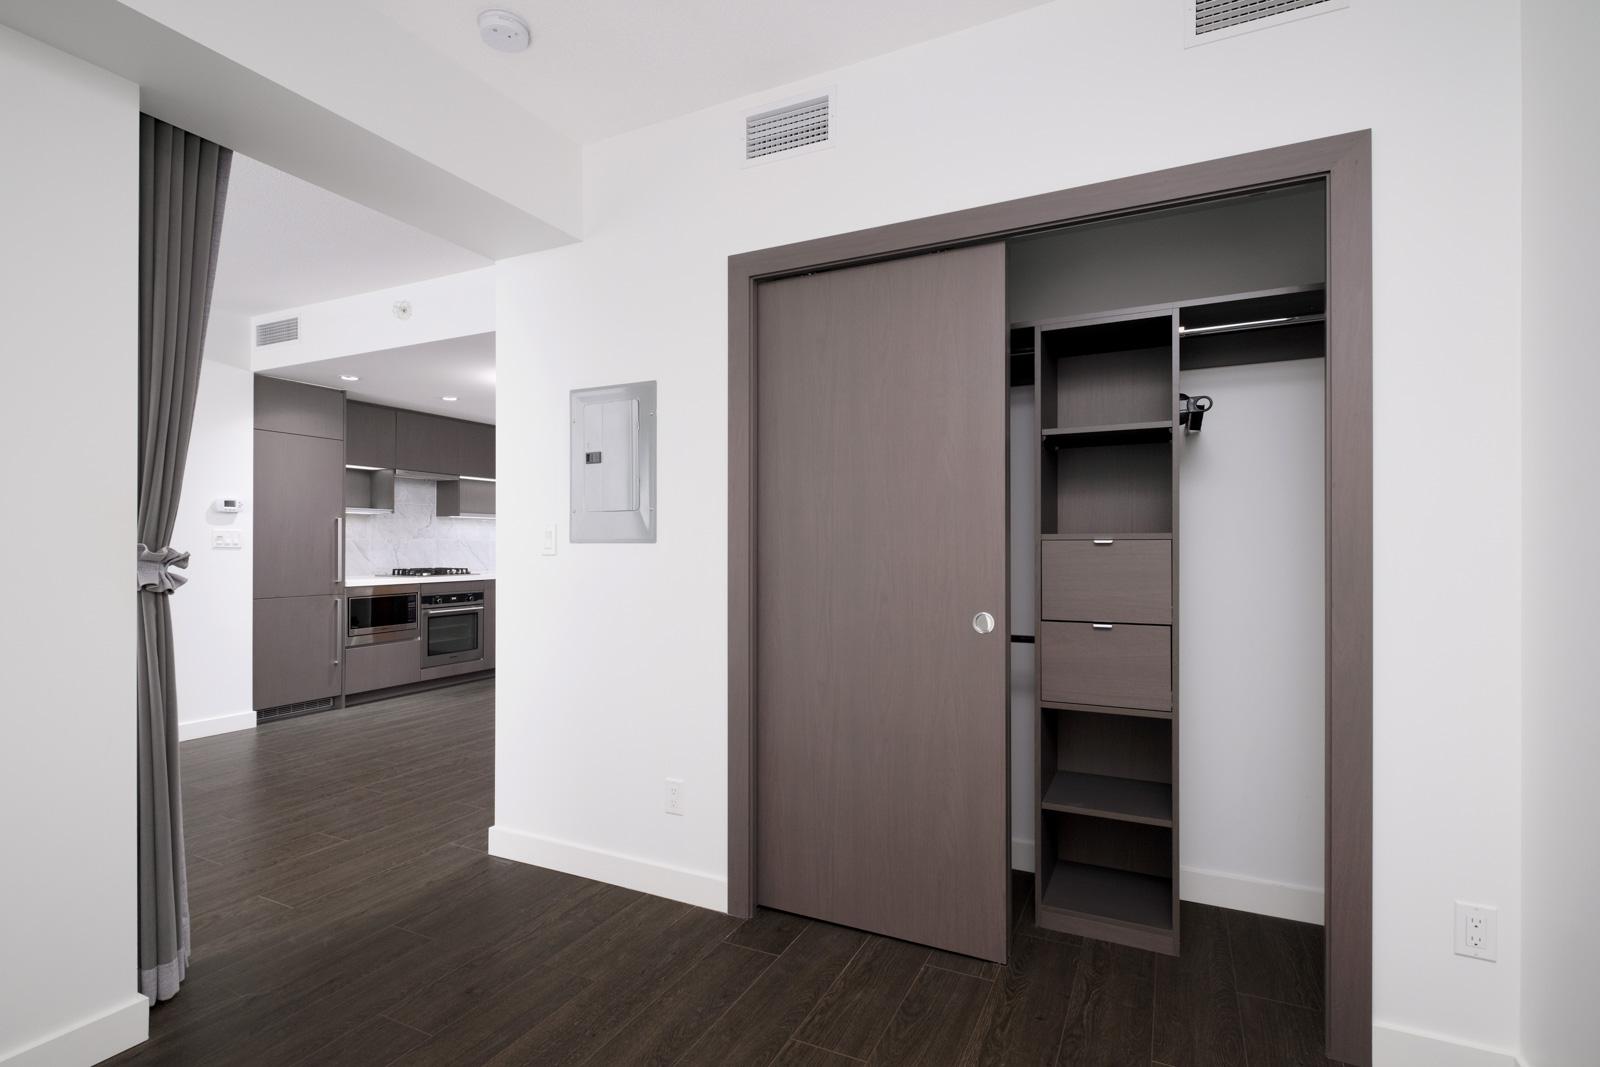 bedroom with closet in rental condo at met2 in rental condo in the metrotown neighborhood of Burnaby